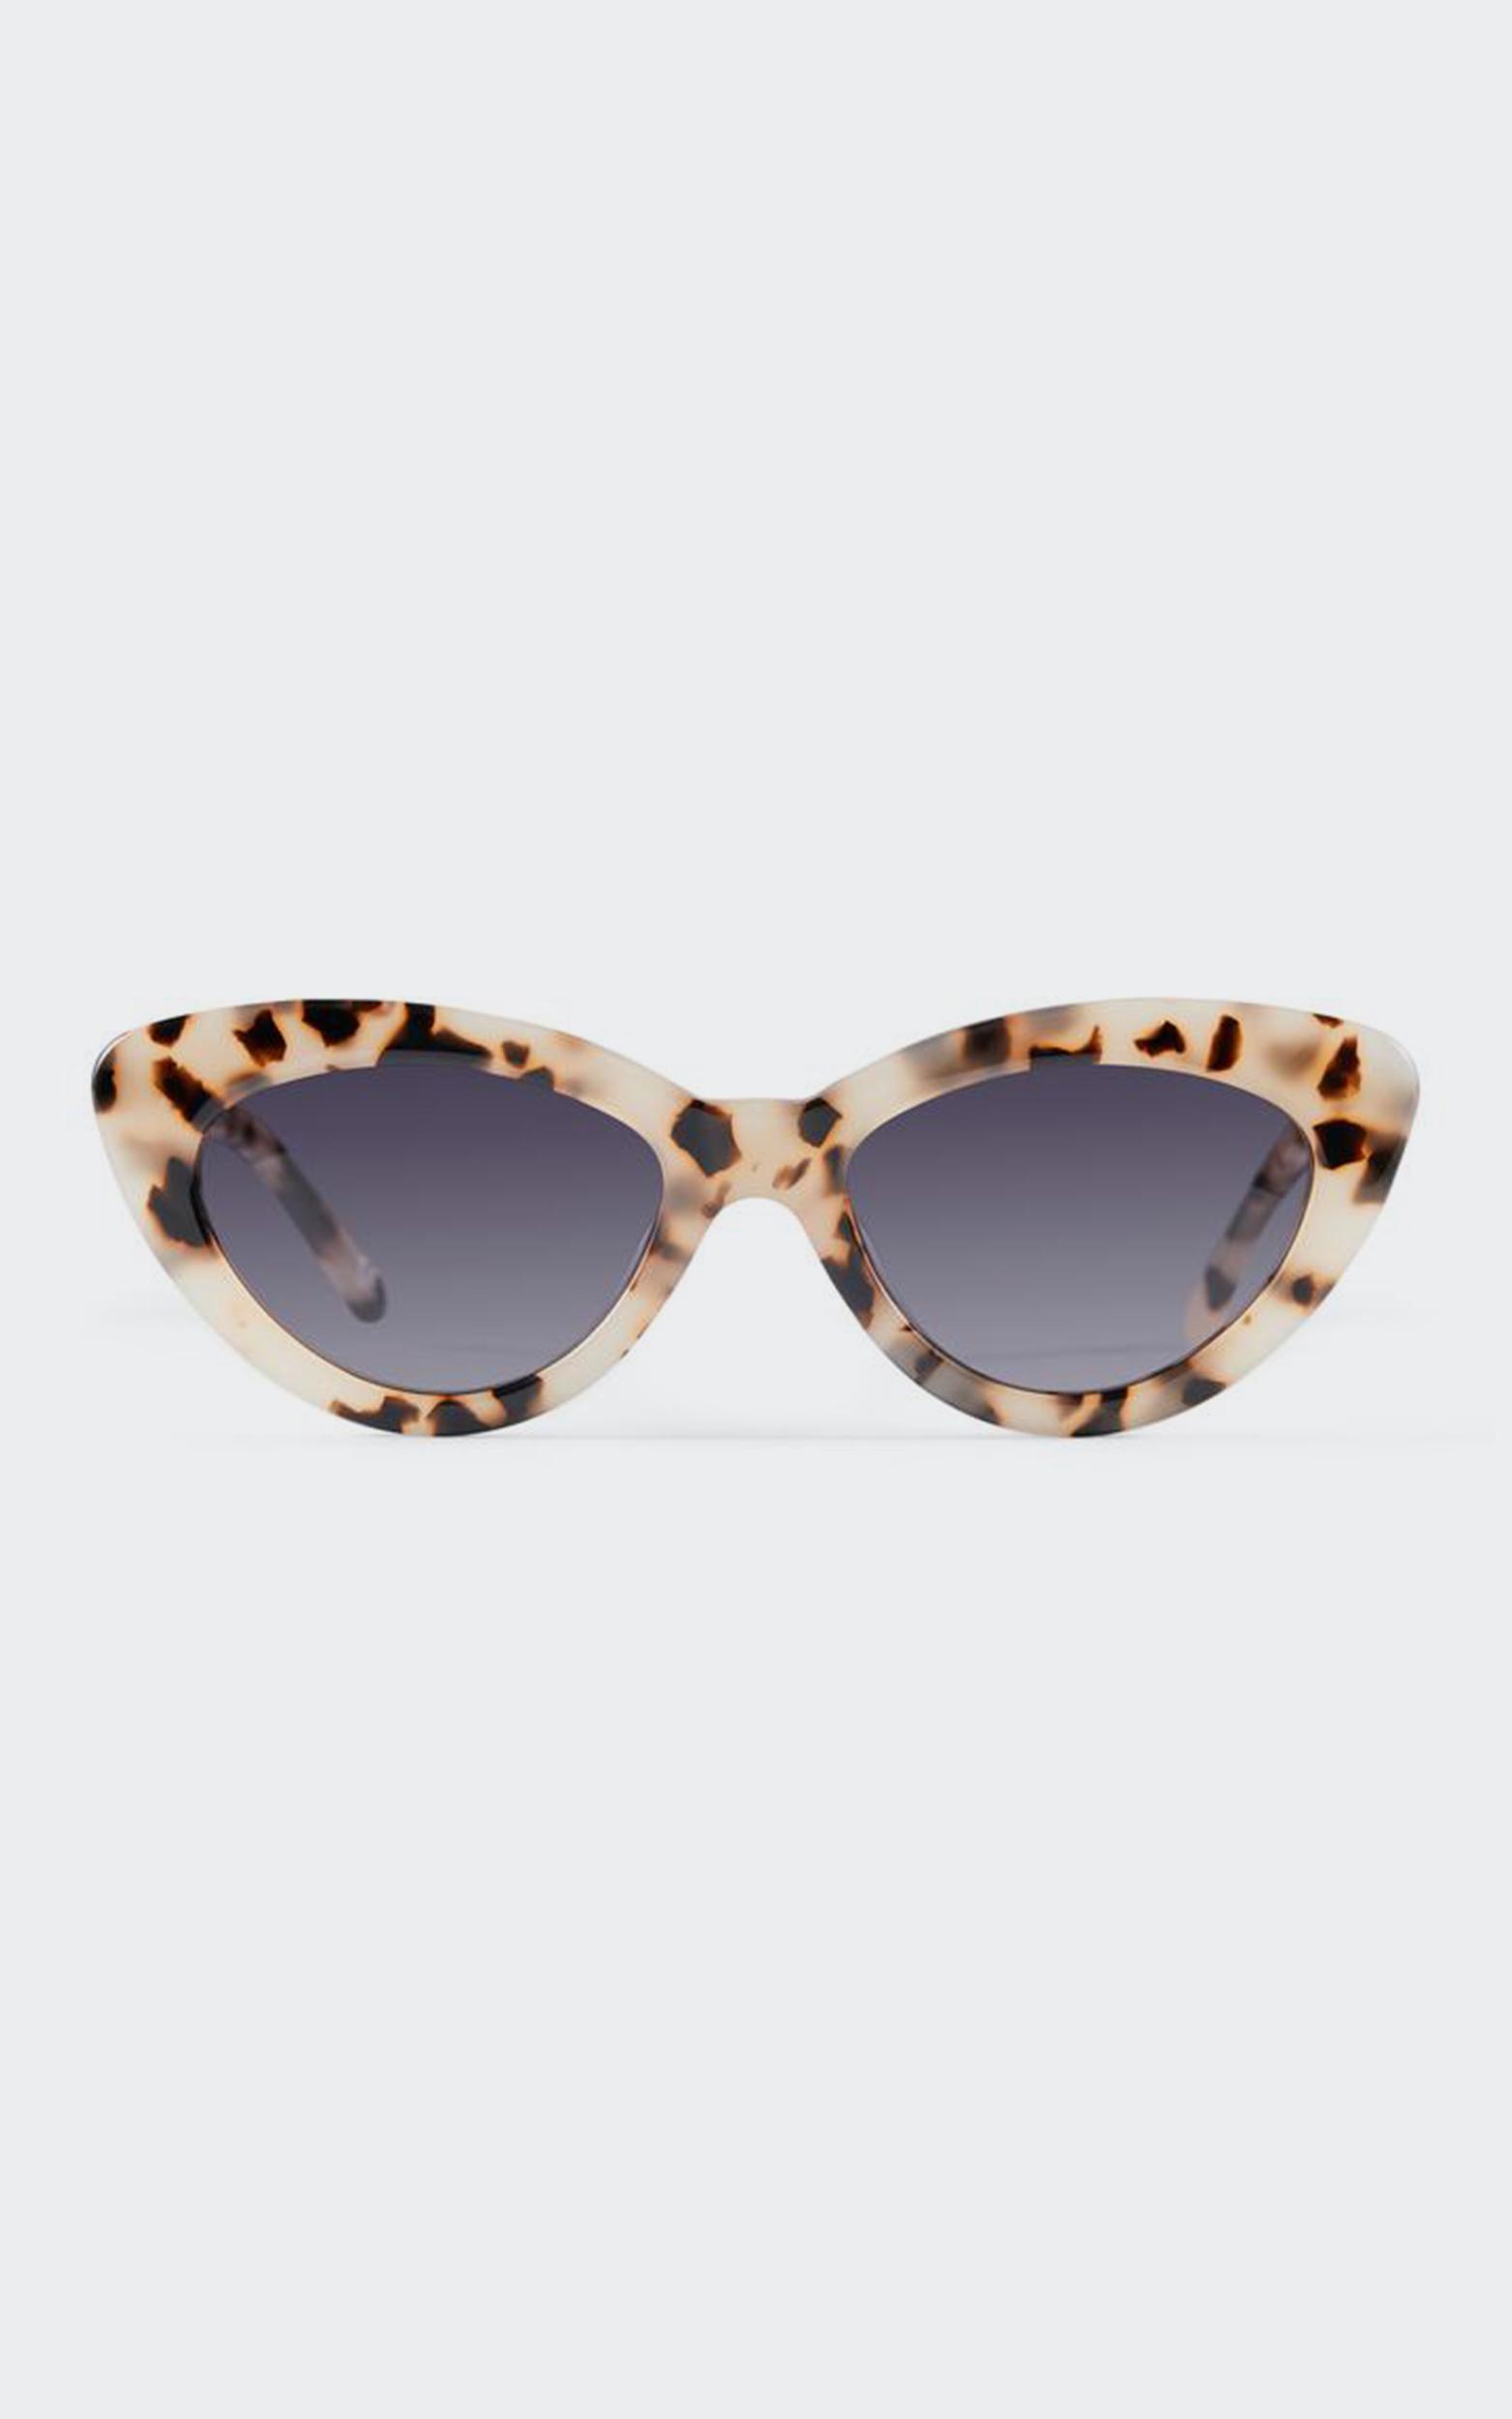 Luv Lou - The Harley Sunglasses in Cream Tort, Cream, hi-res image number null